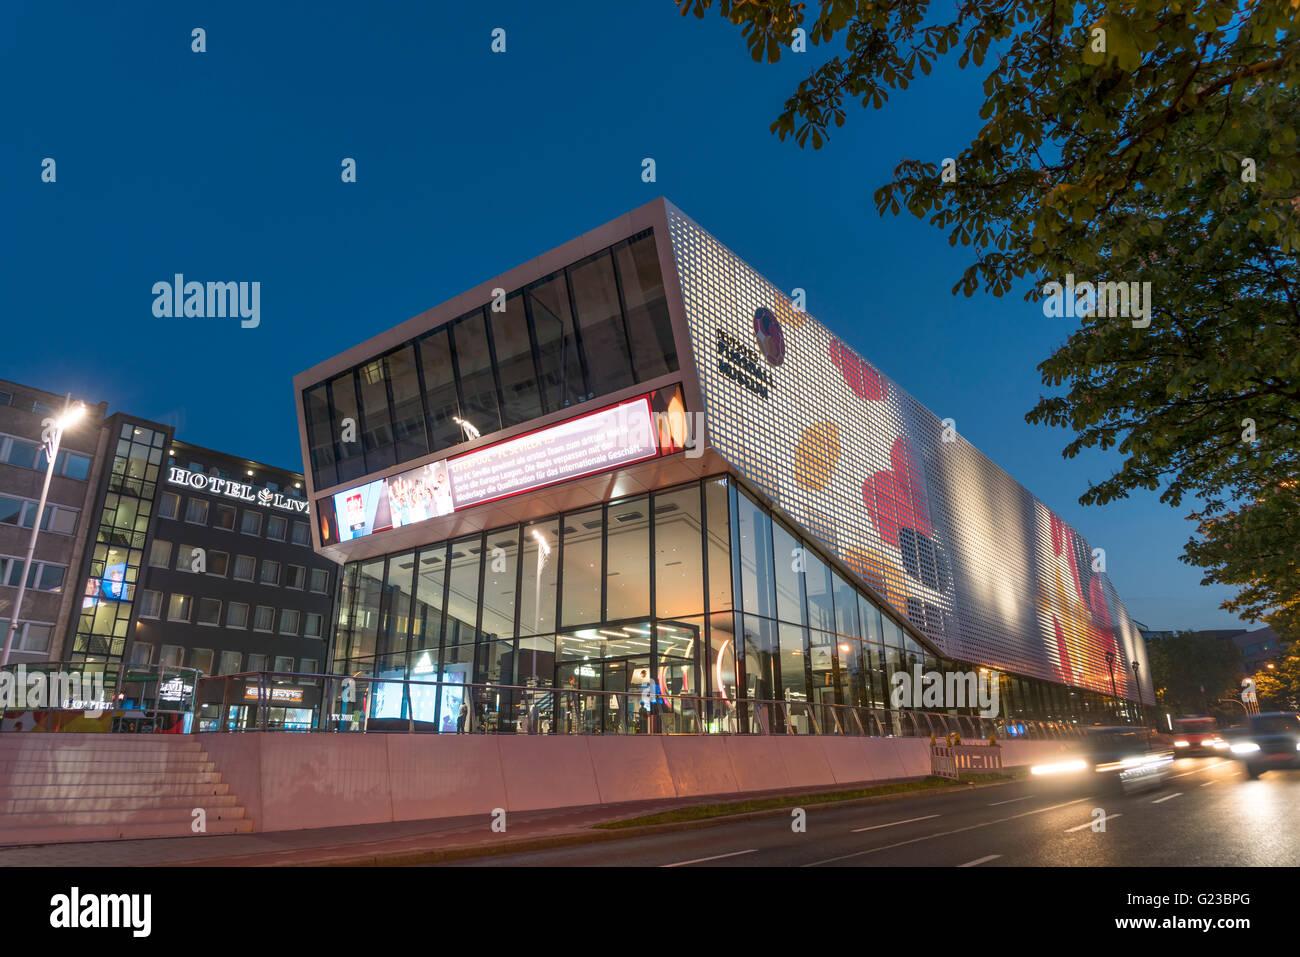 The German Football Museum in Dortmund, North Rhine-Westphalia, Germany, Europe - Stock Image